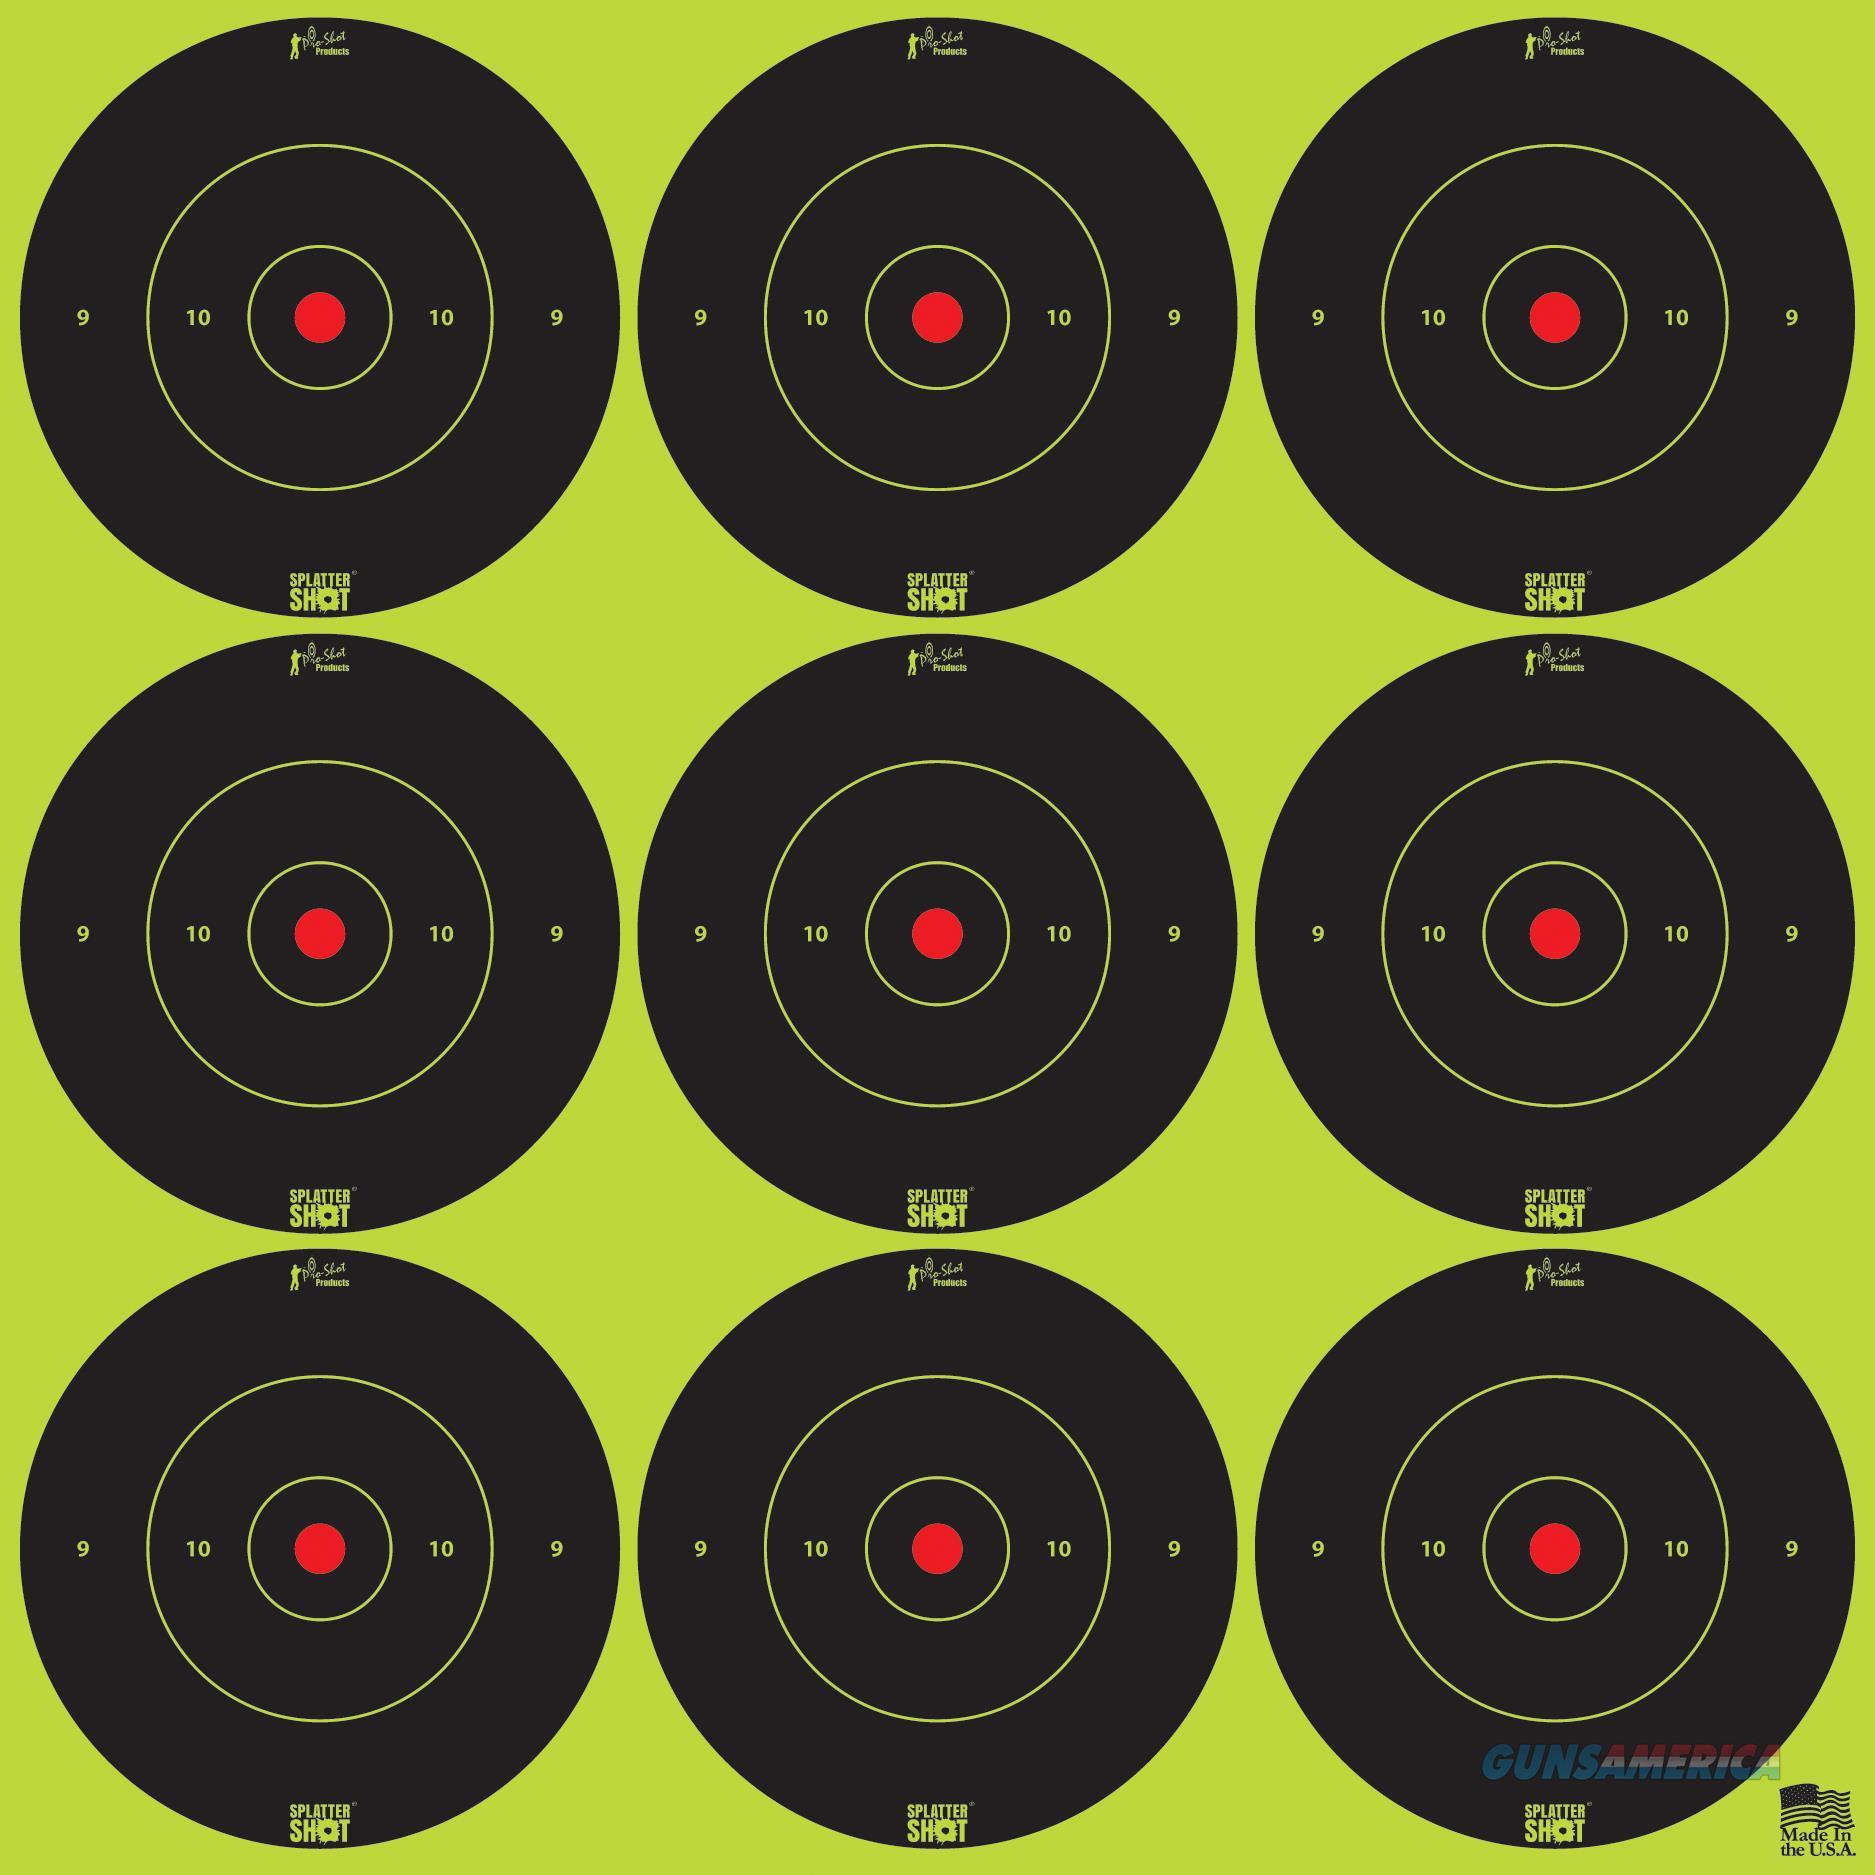 Pro-shot Splattershot, Proshot 2b-green-108  2 Splattershot Bullseye Trg  Guns > Pistols > 1911 Pistol Copies (non-Colt)